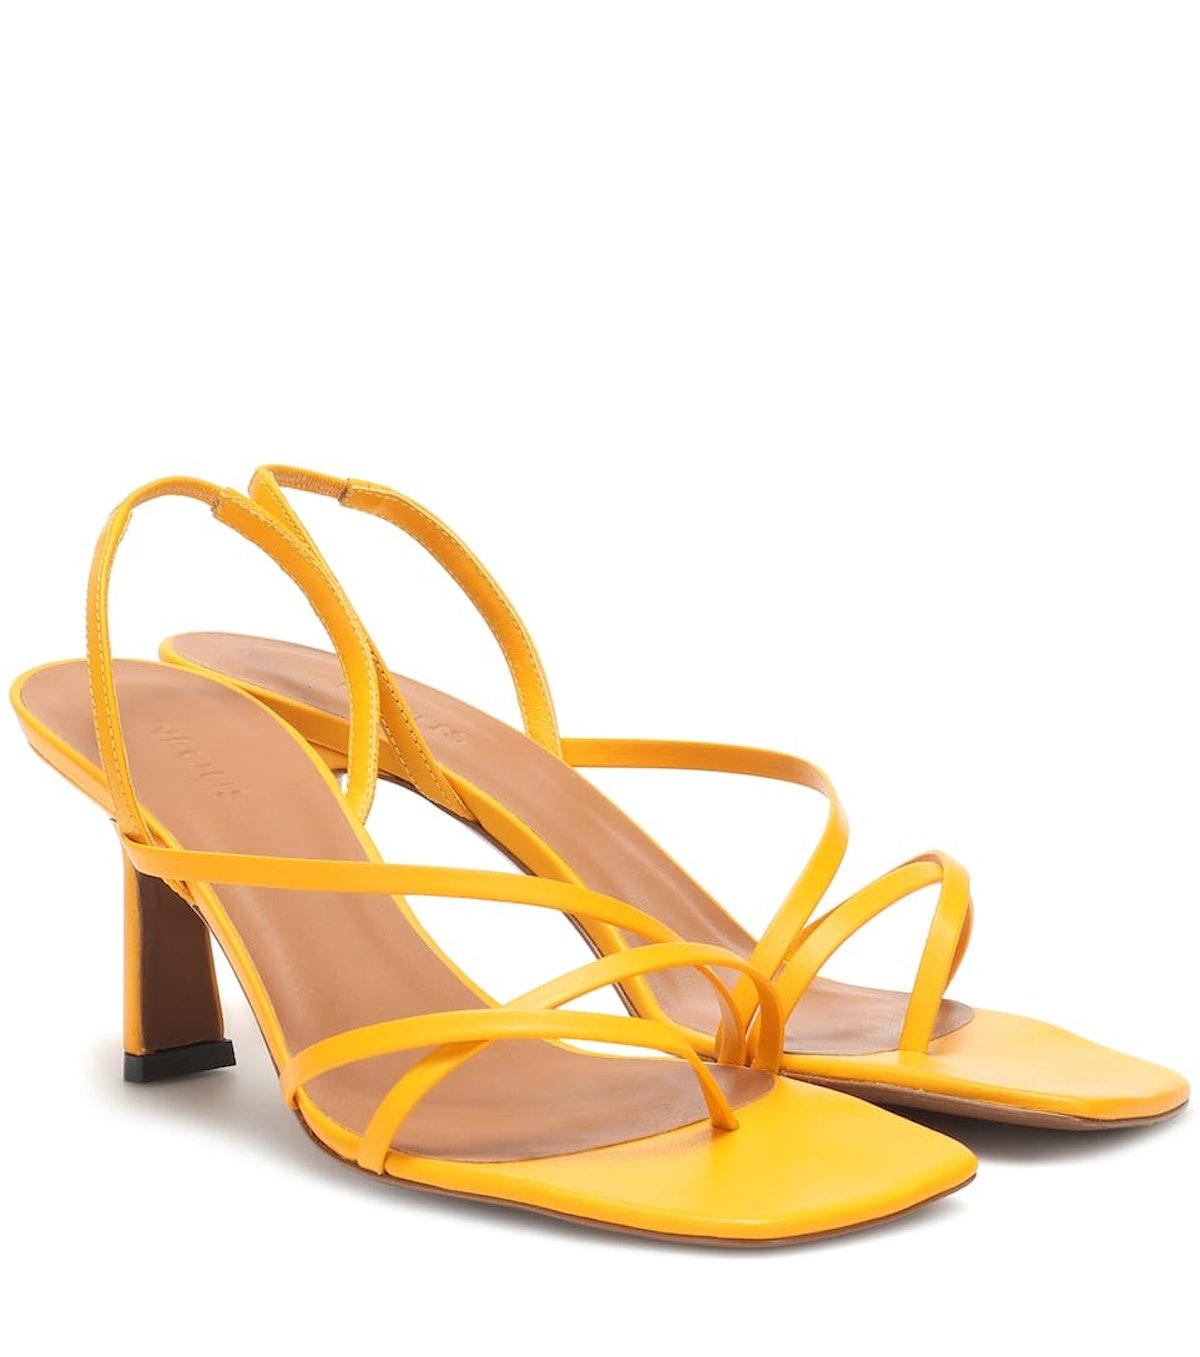 Esmeralda Leather Sandals